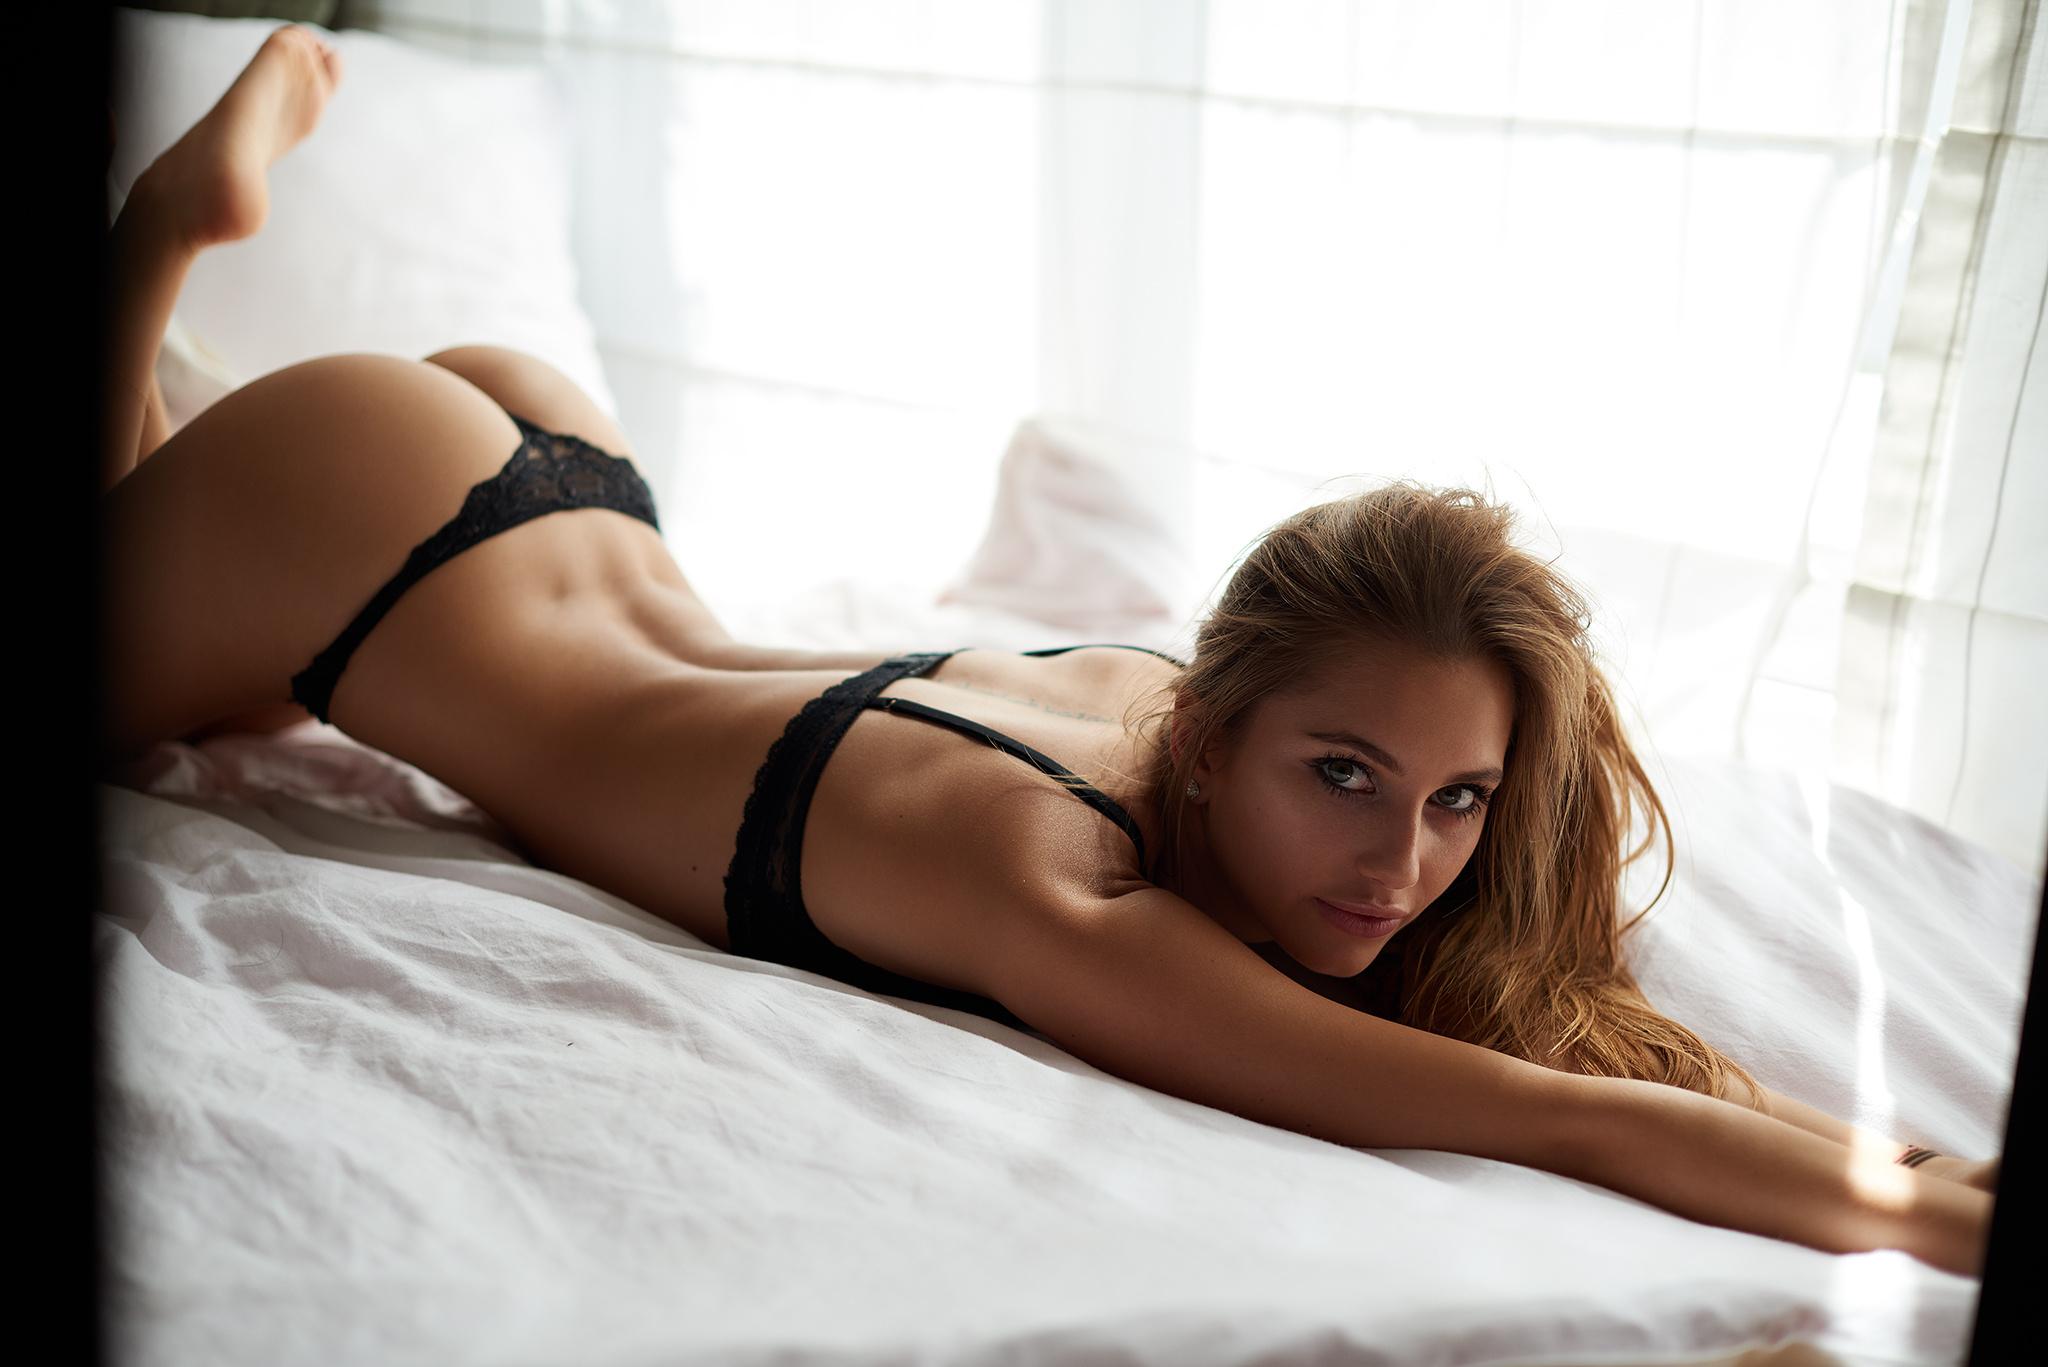 Paulina Mikolajczak photos